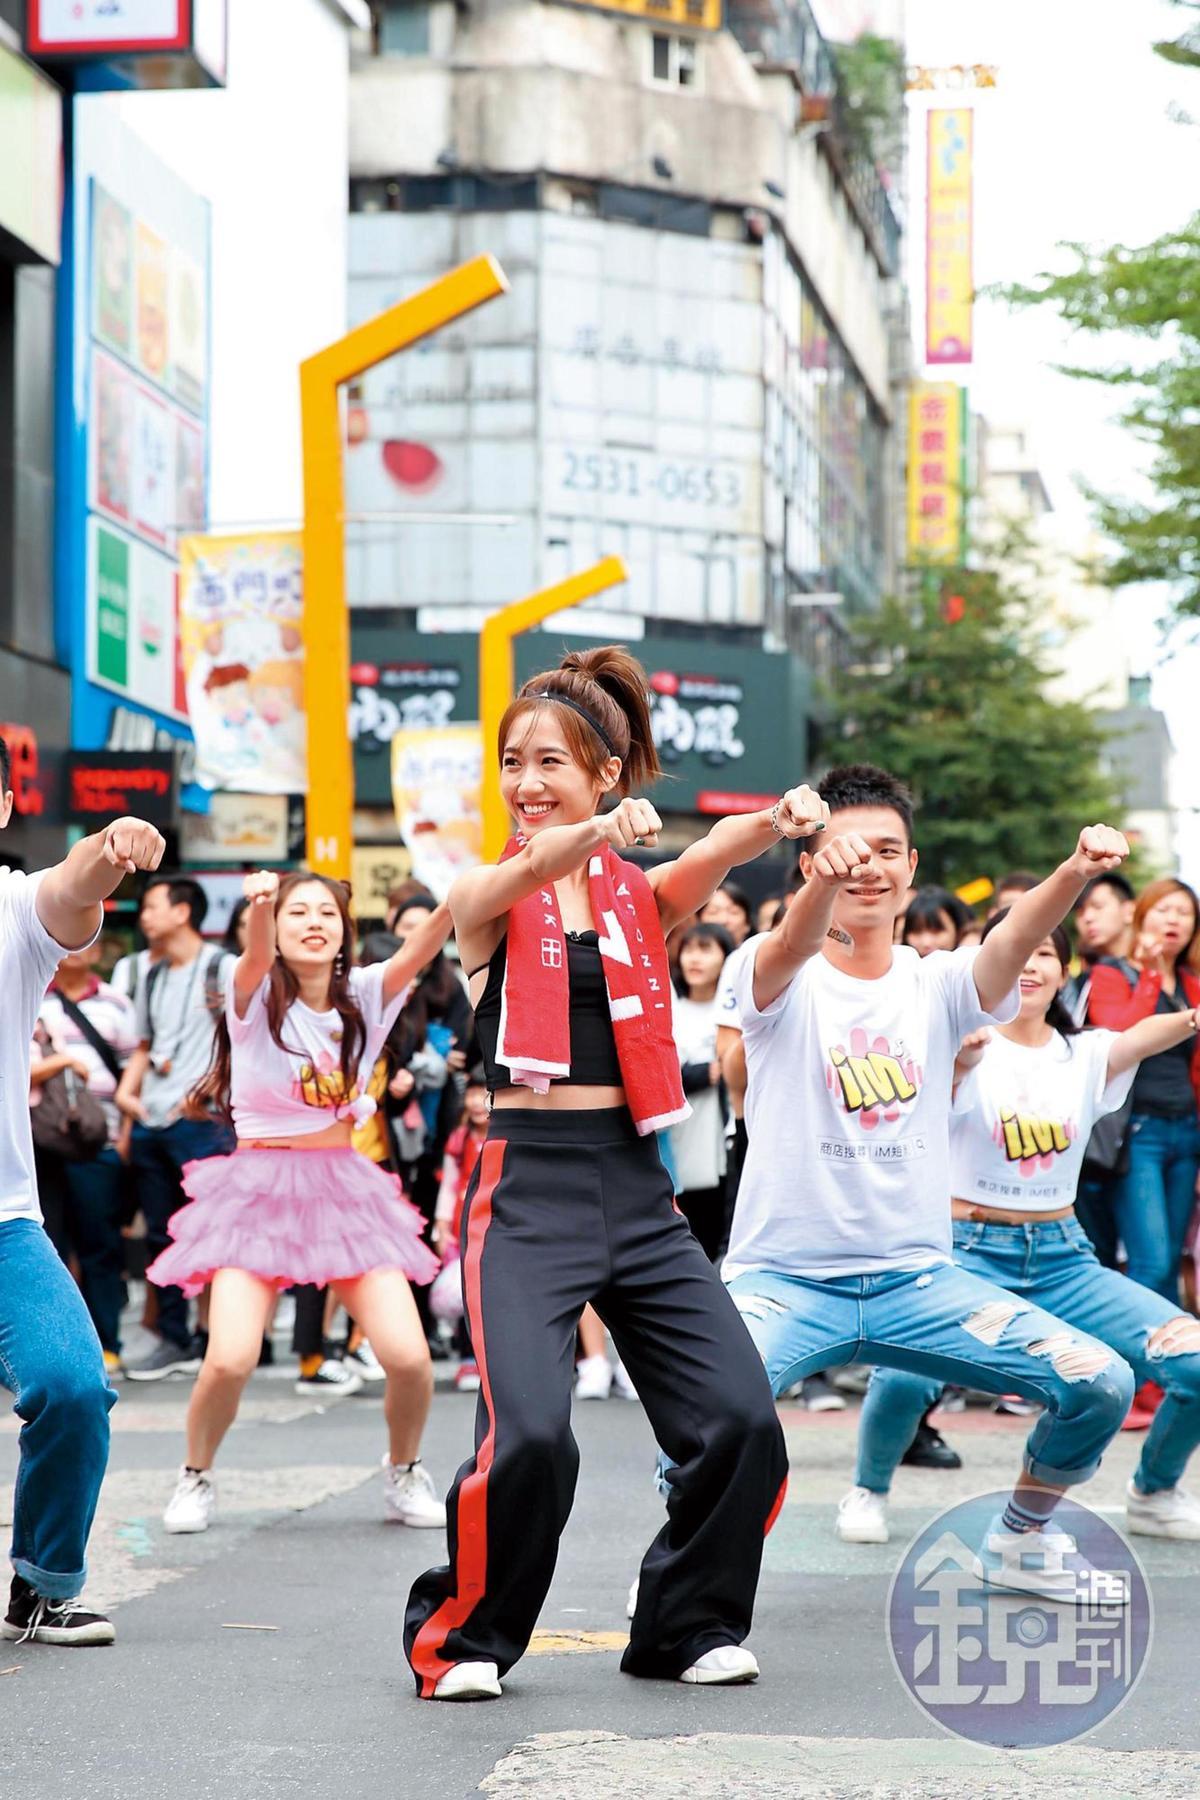 iM短影邀約各界人士一同參與短影音做公益活動,Lulu甚至走上街頭號邀粉絲一起做。